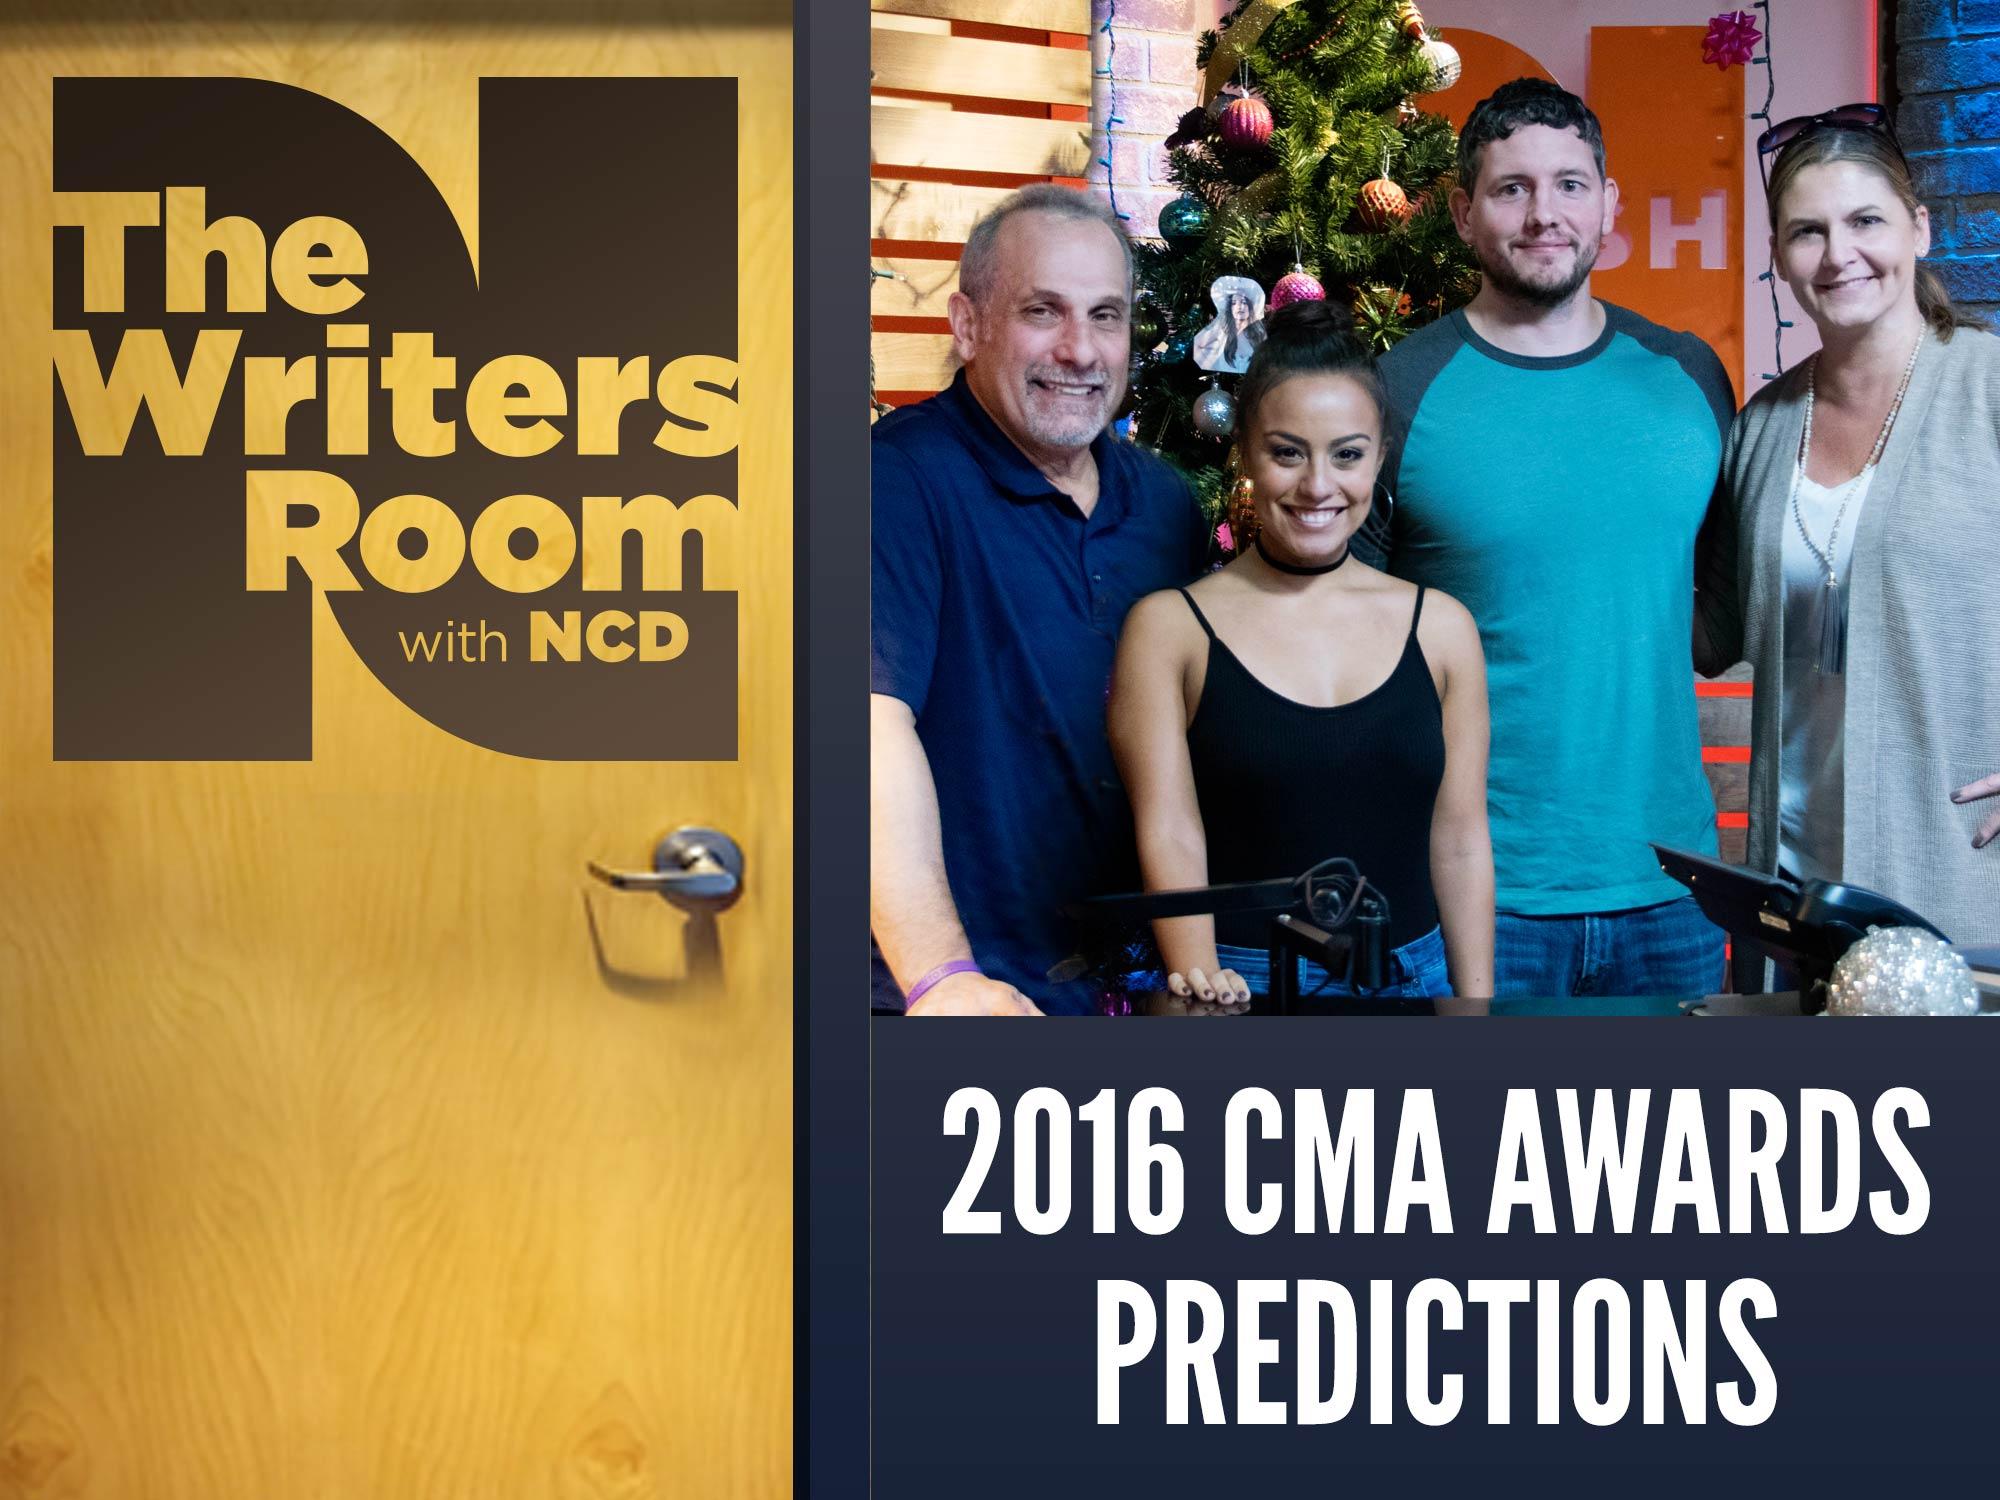 2016 CMA Awards Predictions